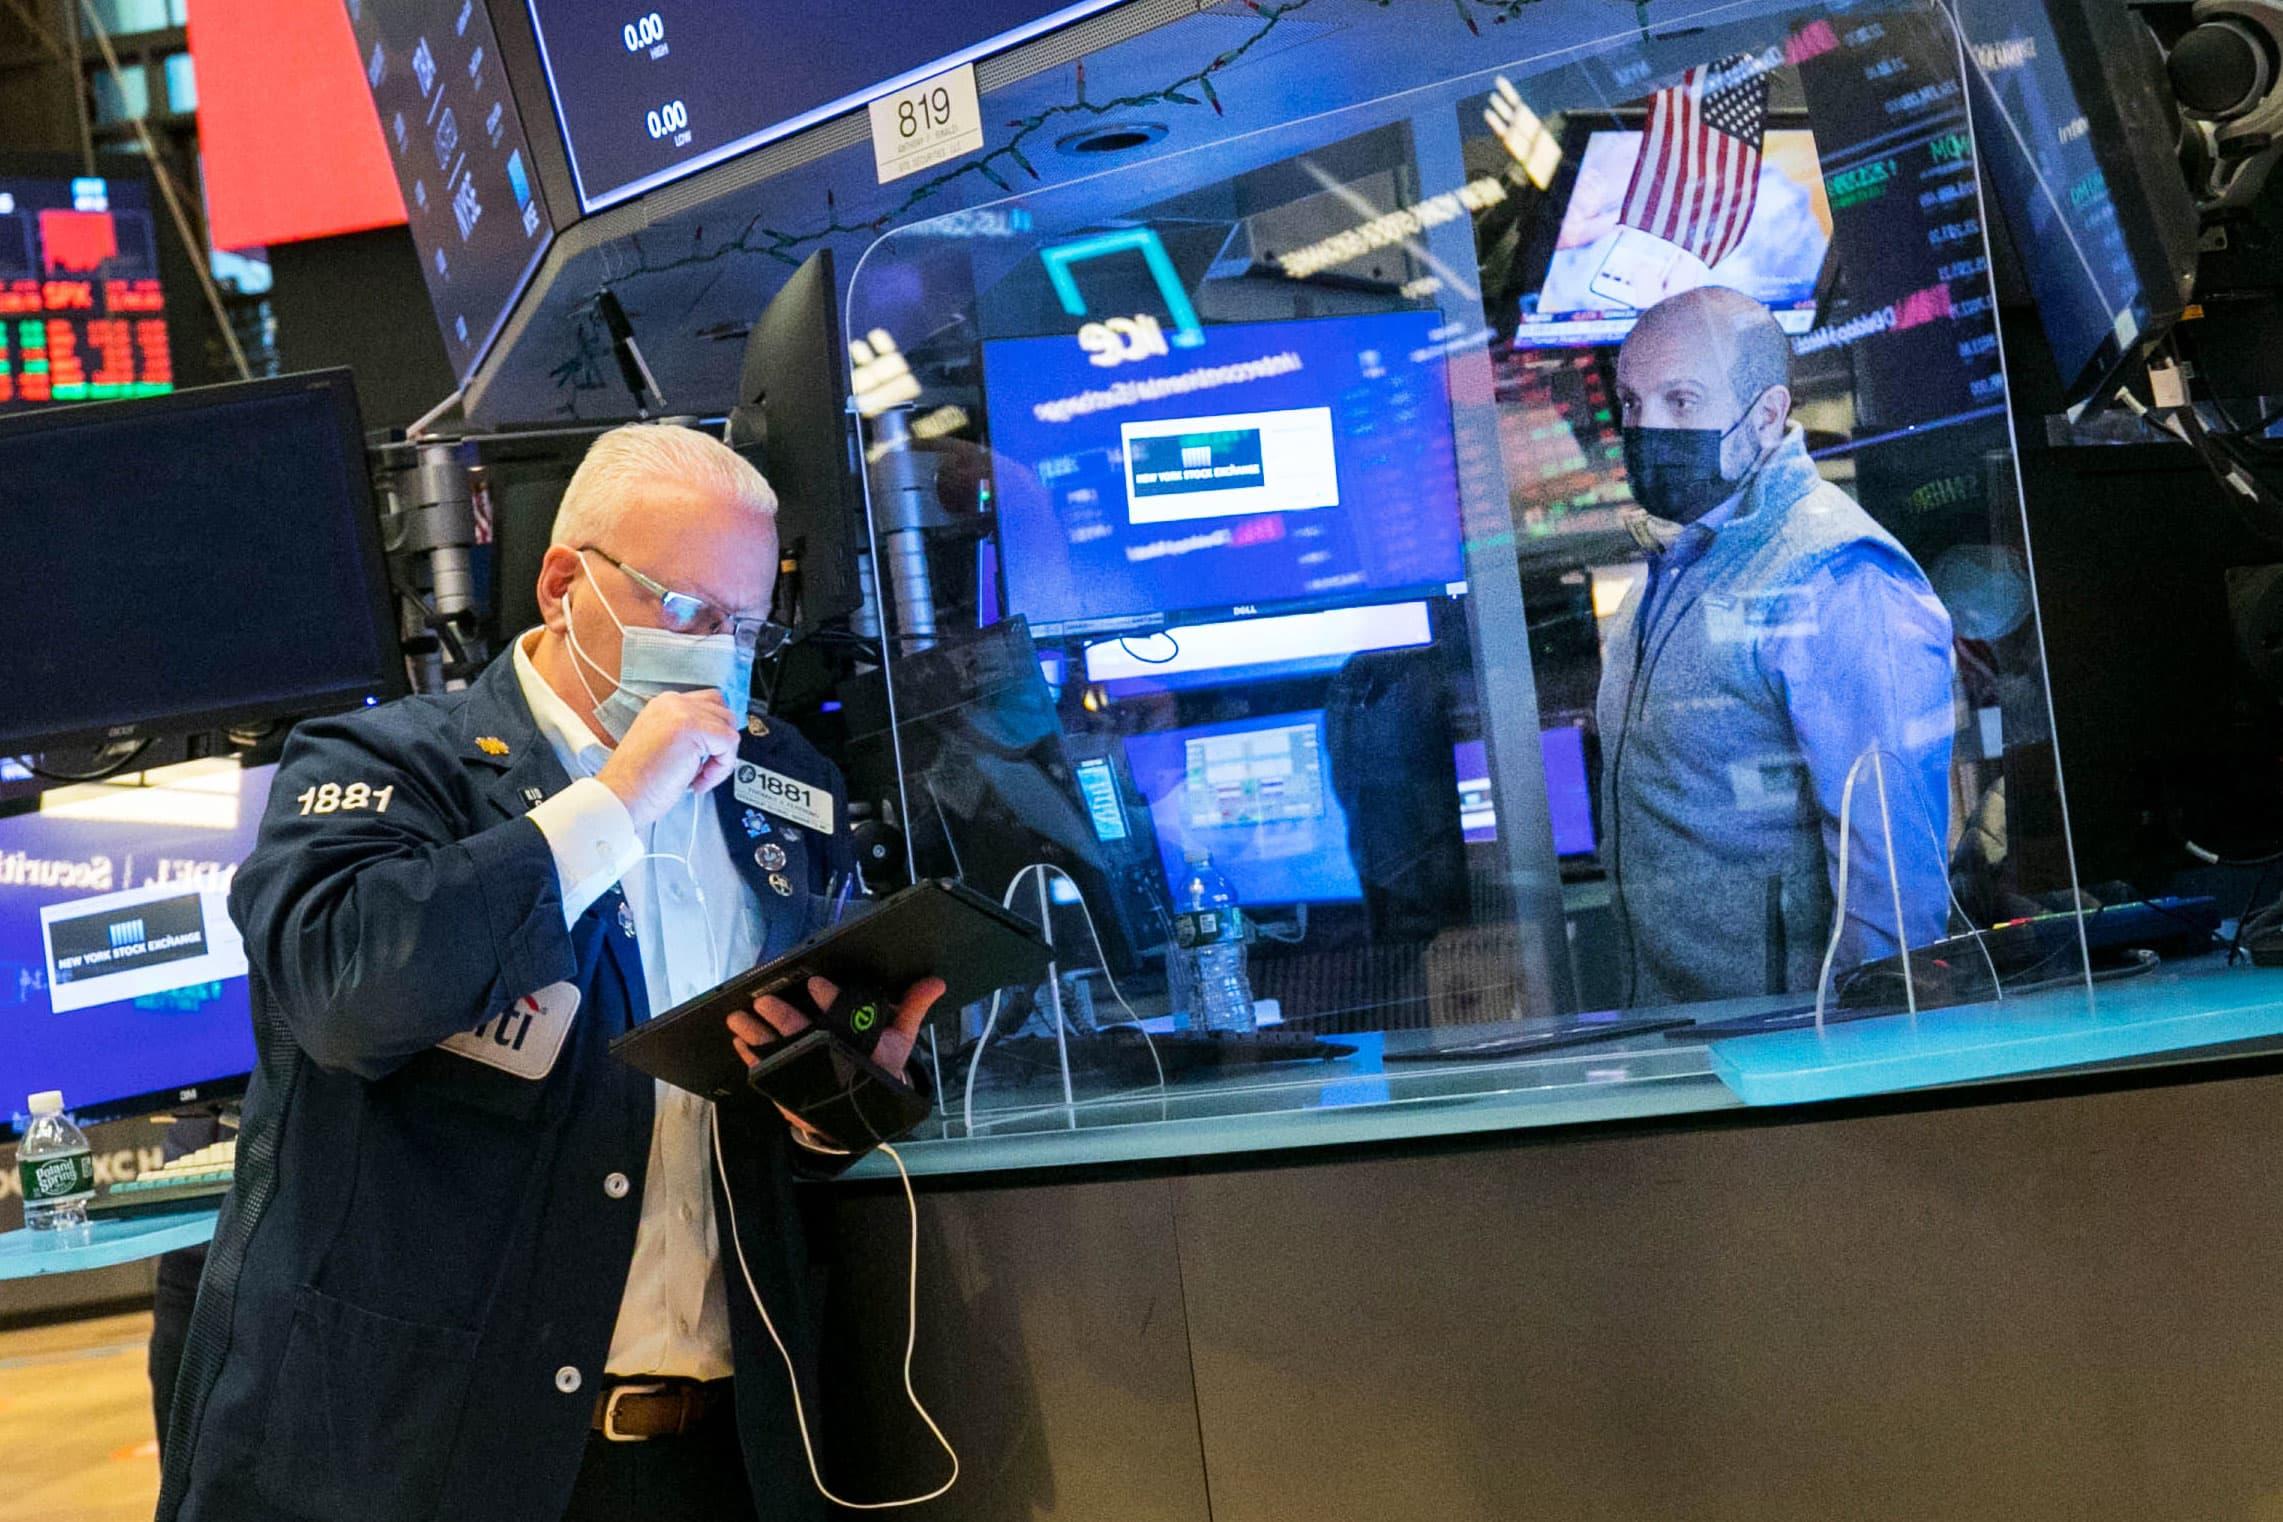 Stock market live updates: Nasdaq and S&P 500 set records tech leads bitcoin struggles – CNBC